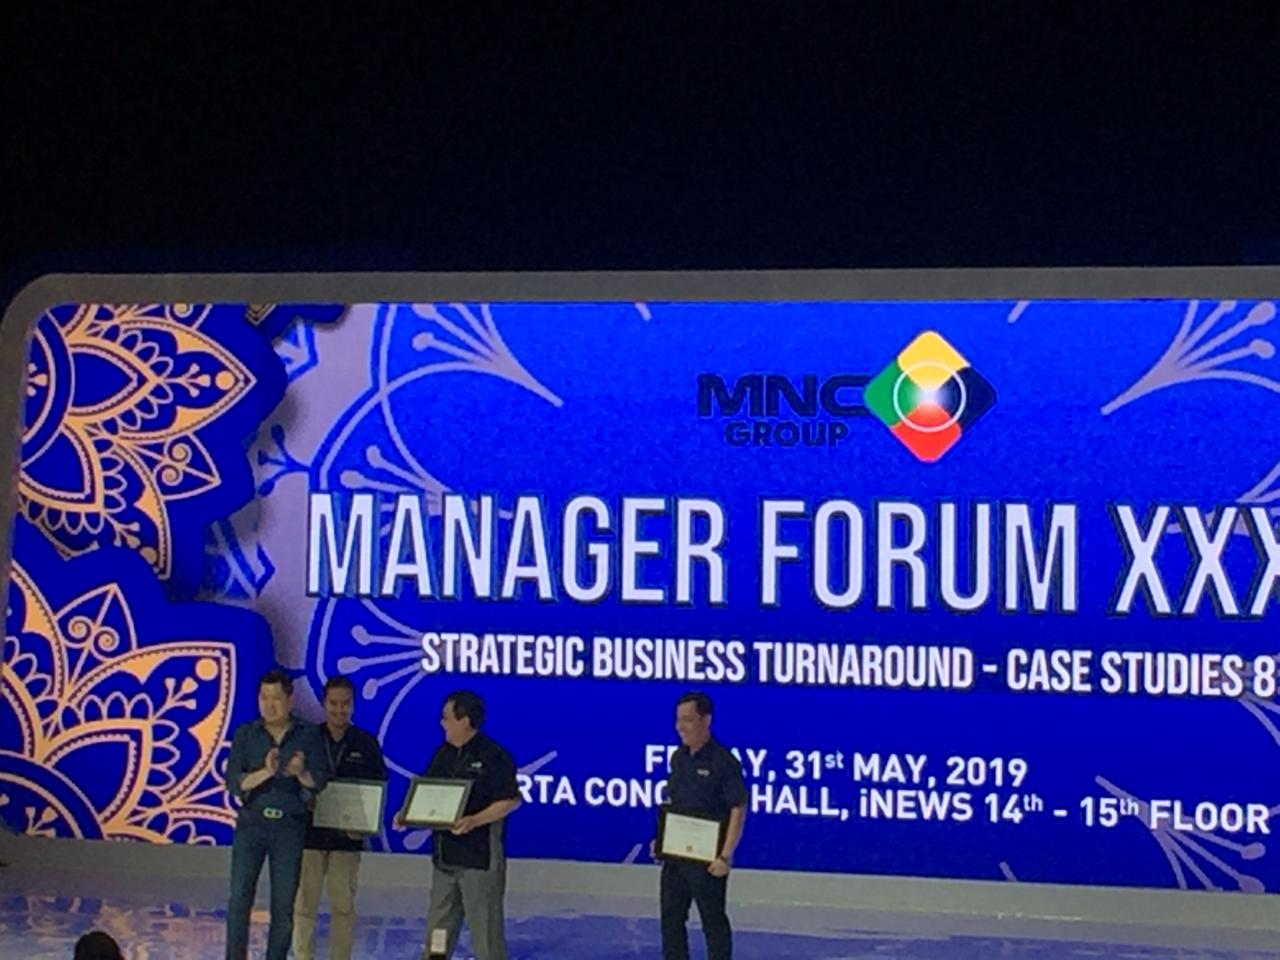 https: img-o.okeinfo.net content 2019 05 31 320 2062662 gelar-manager-forum-mnc-group-fokus-pada-pengembangan-digital-Js4ncAsW1H.jpg